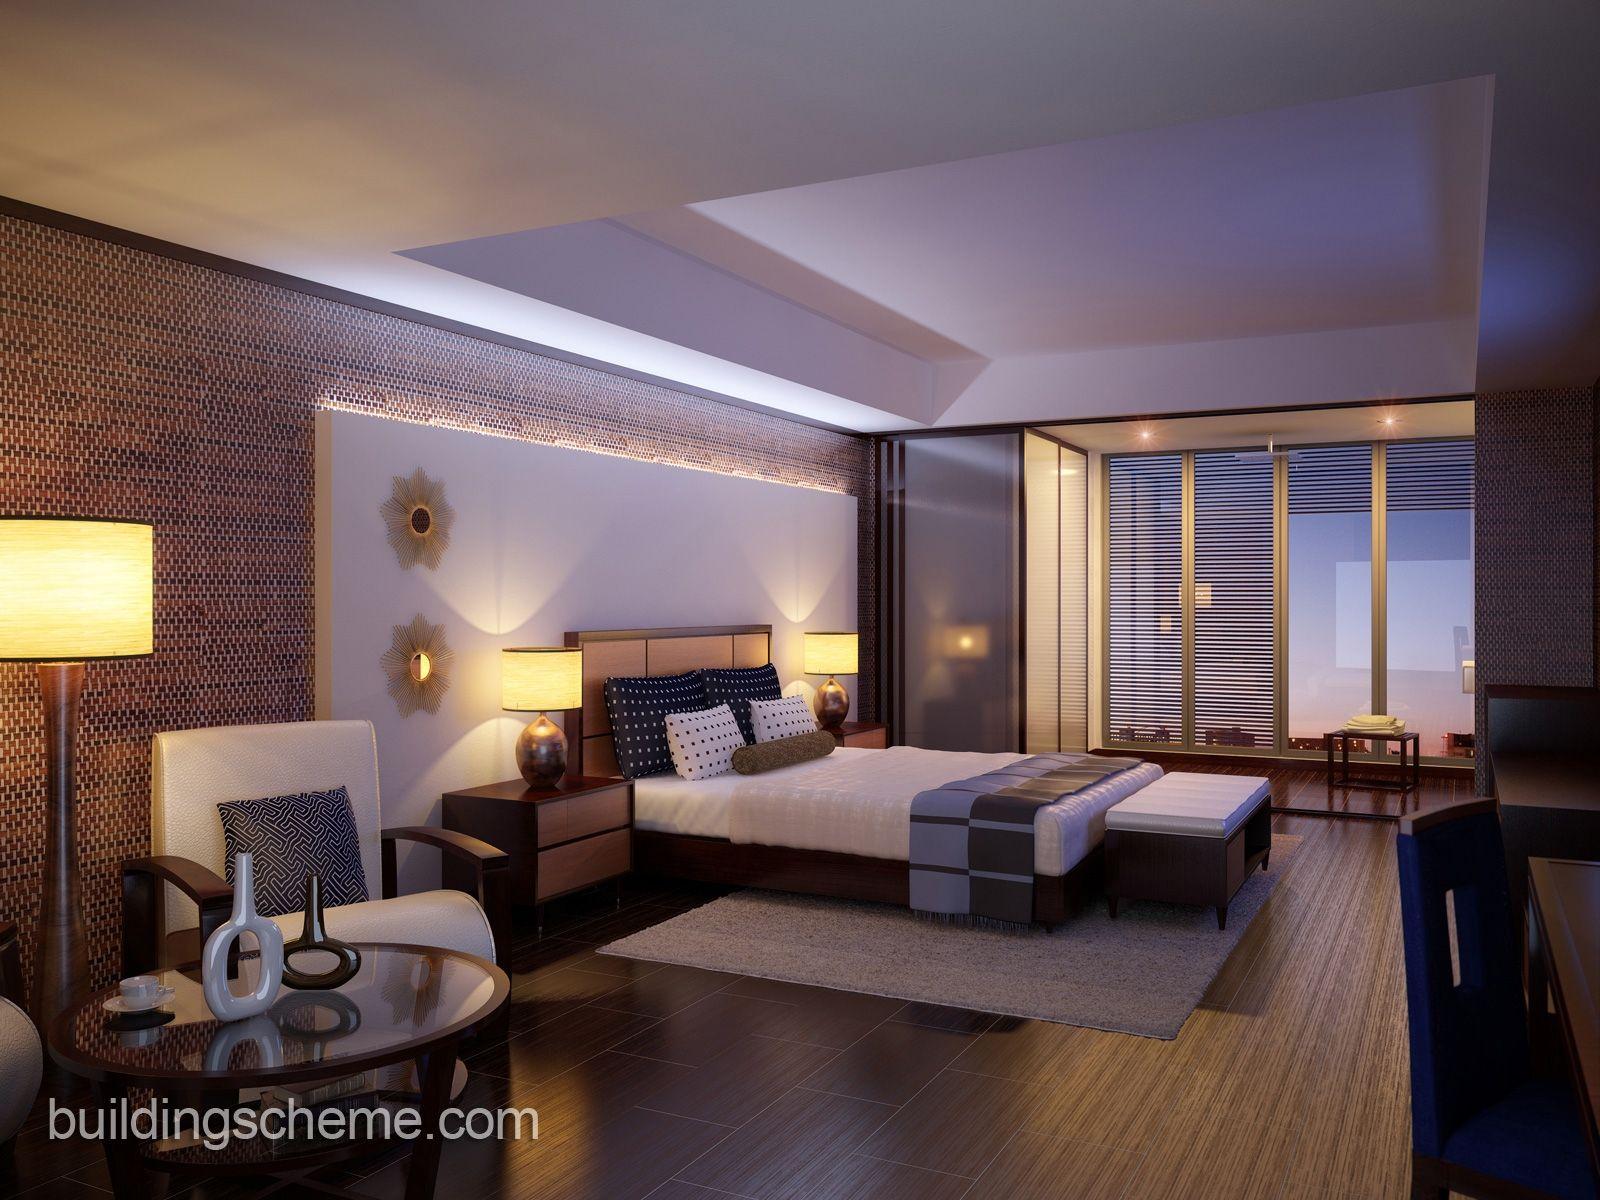 Bedroom Designs For Adults Sweetmodernbedroomdesignsforyoungadultsalongwithstunning